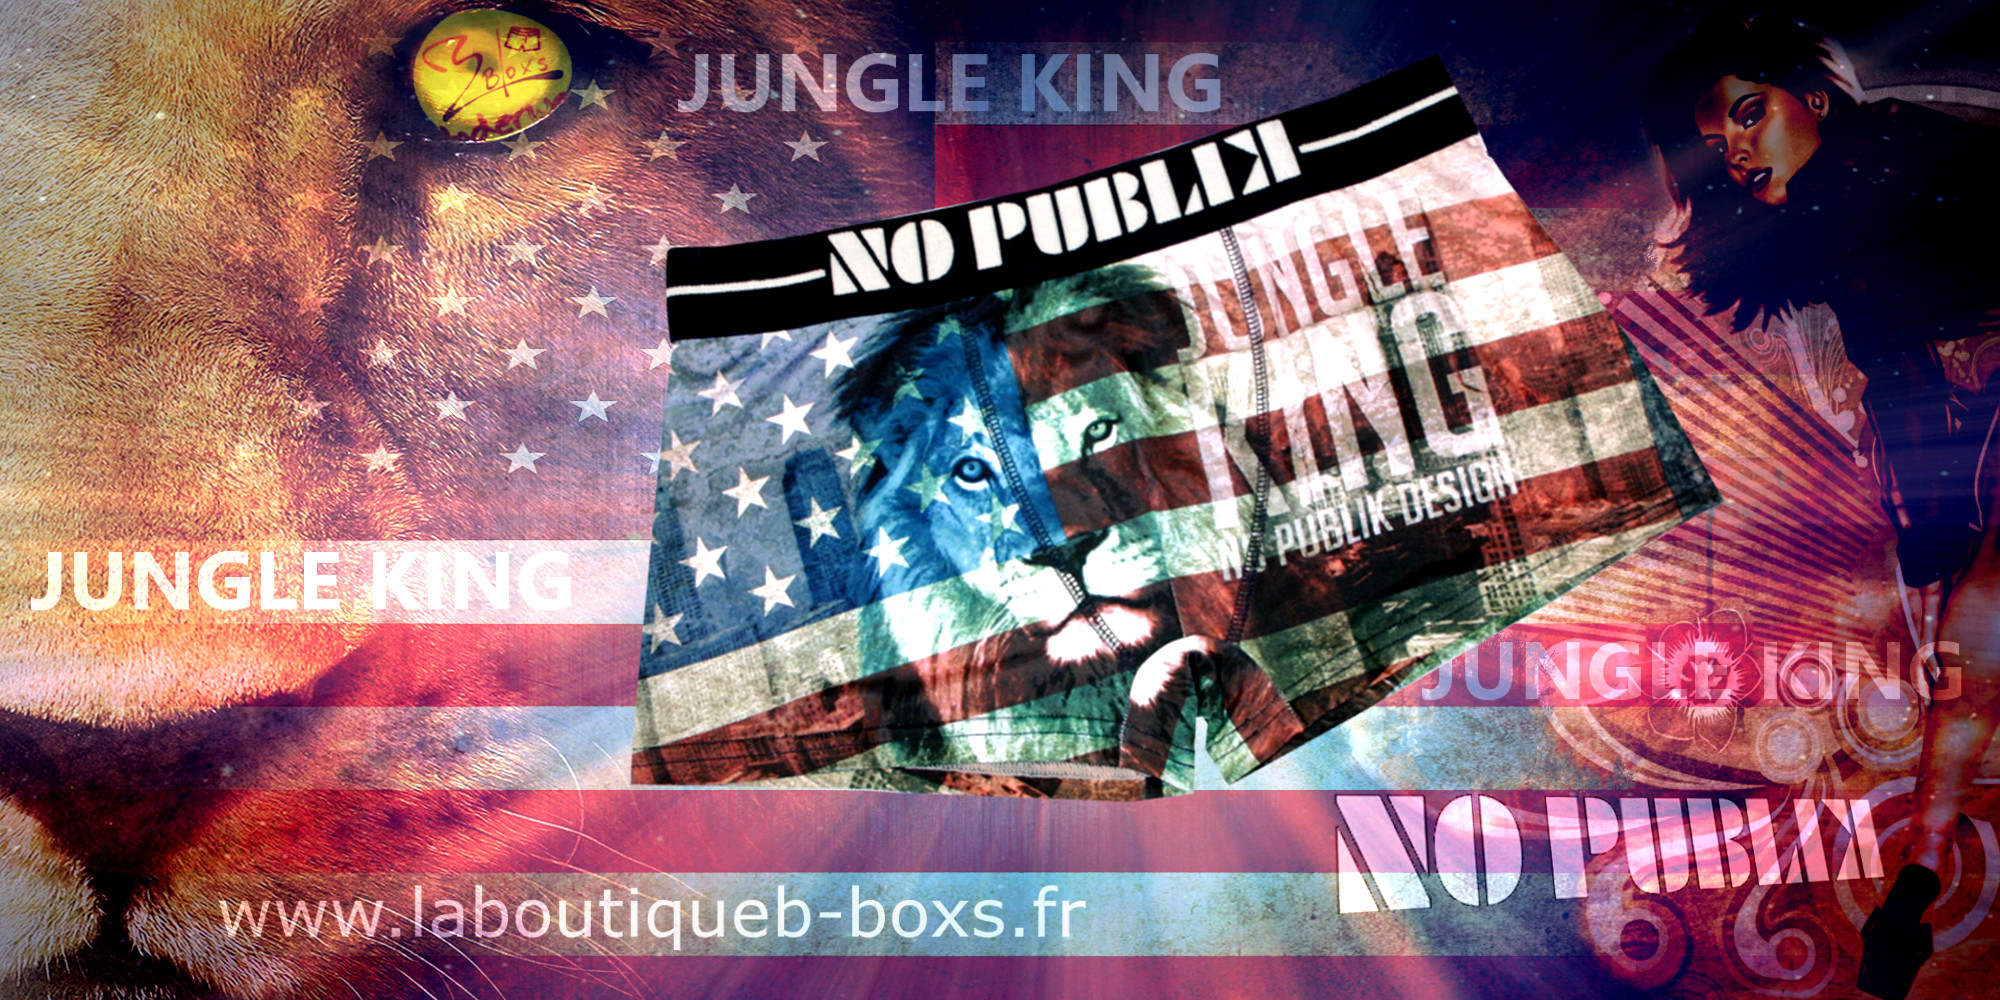 no publik jungle king .jpeg